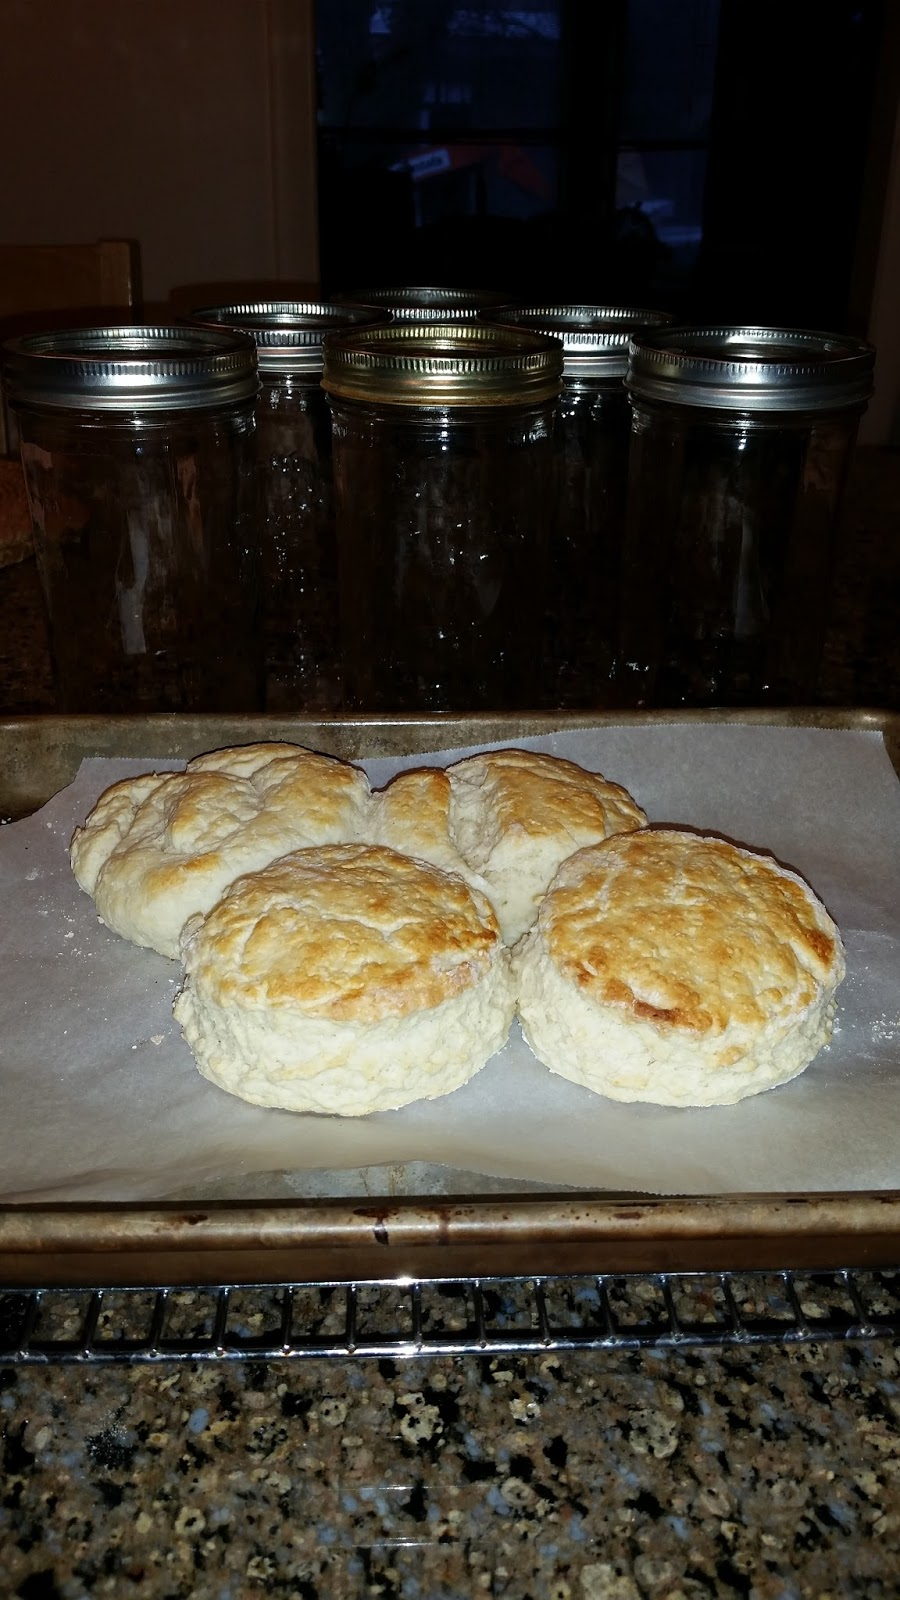 Cooking Blahg Sunrise Biscuit Kitchen Biscuits Food